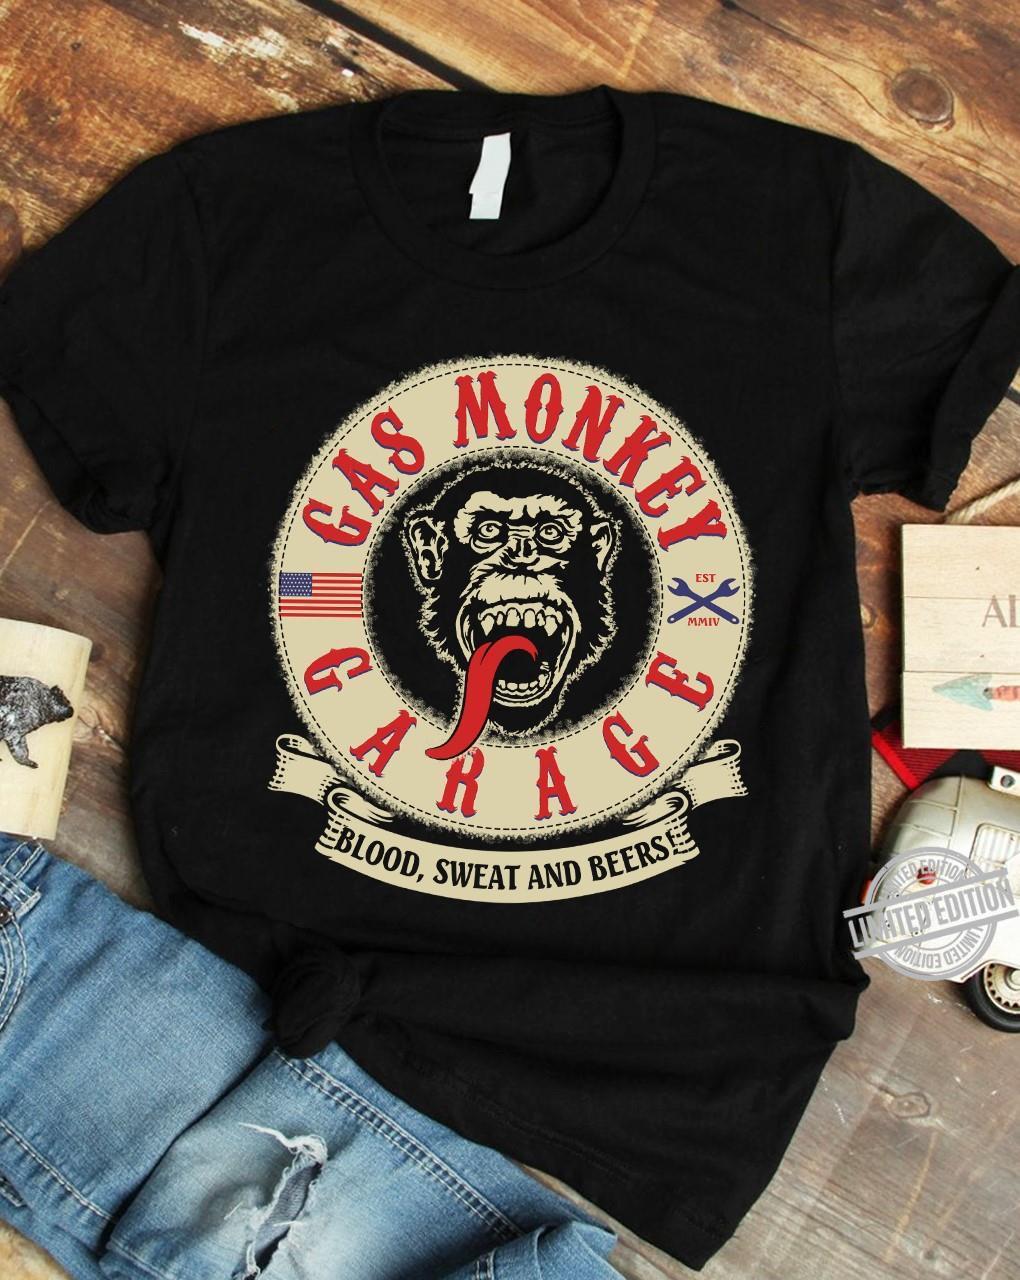 Gá Monkey Garage Blood Sweat And Beers Shirt